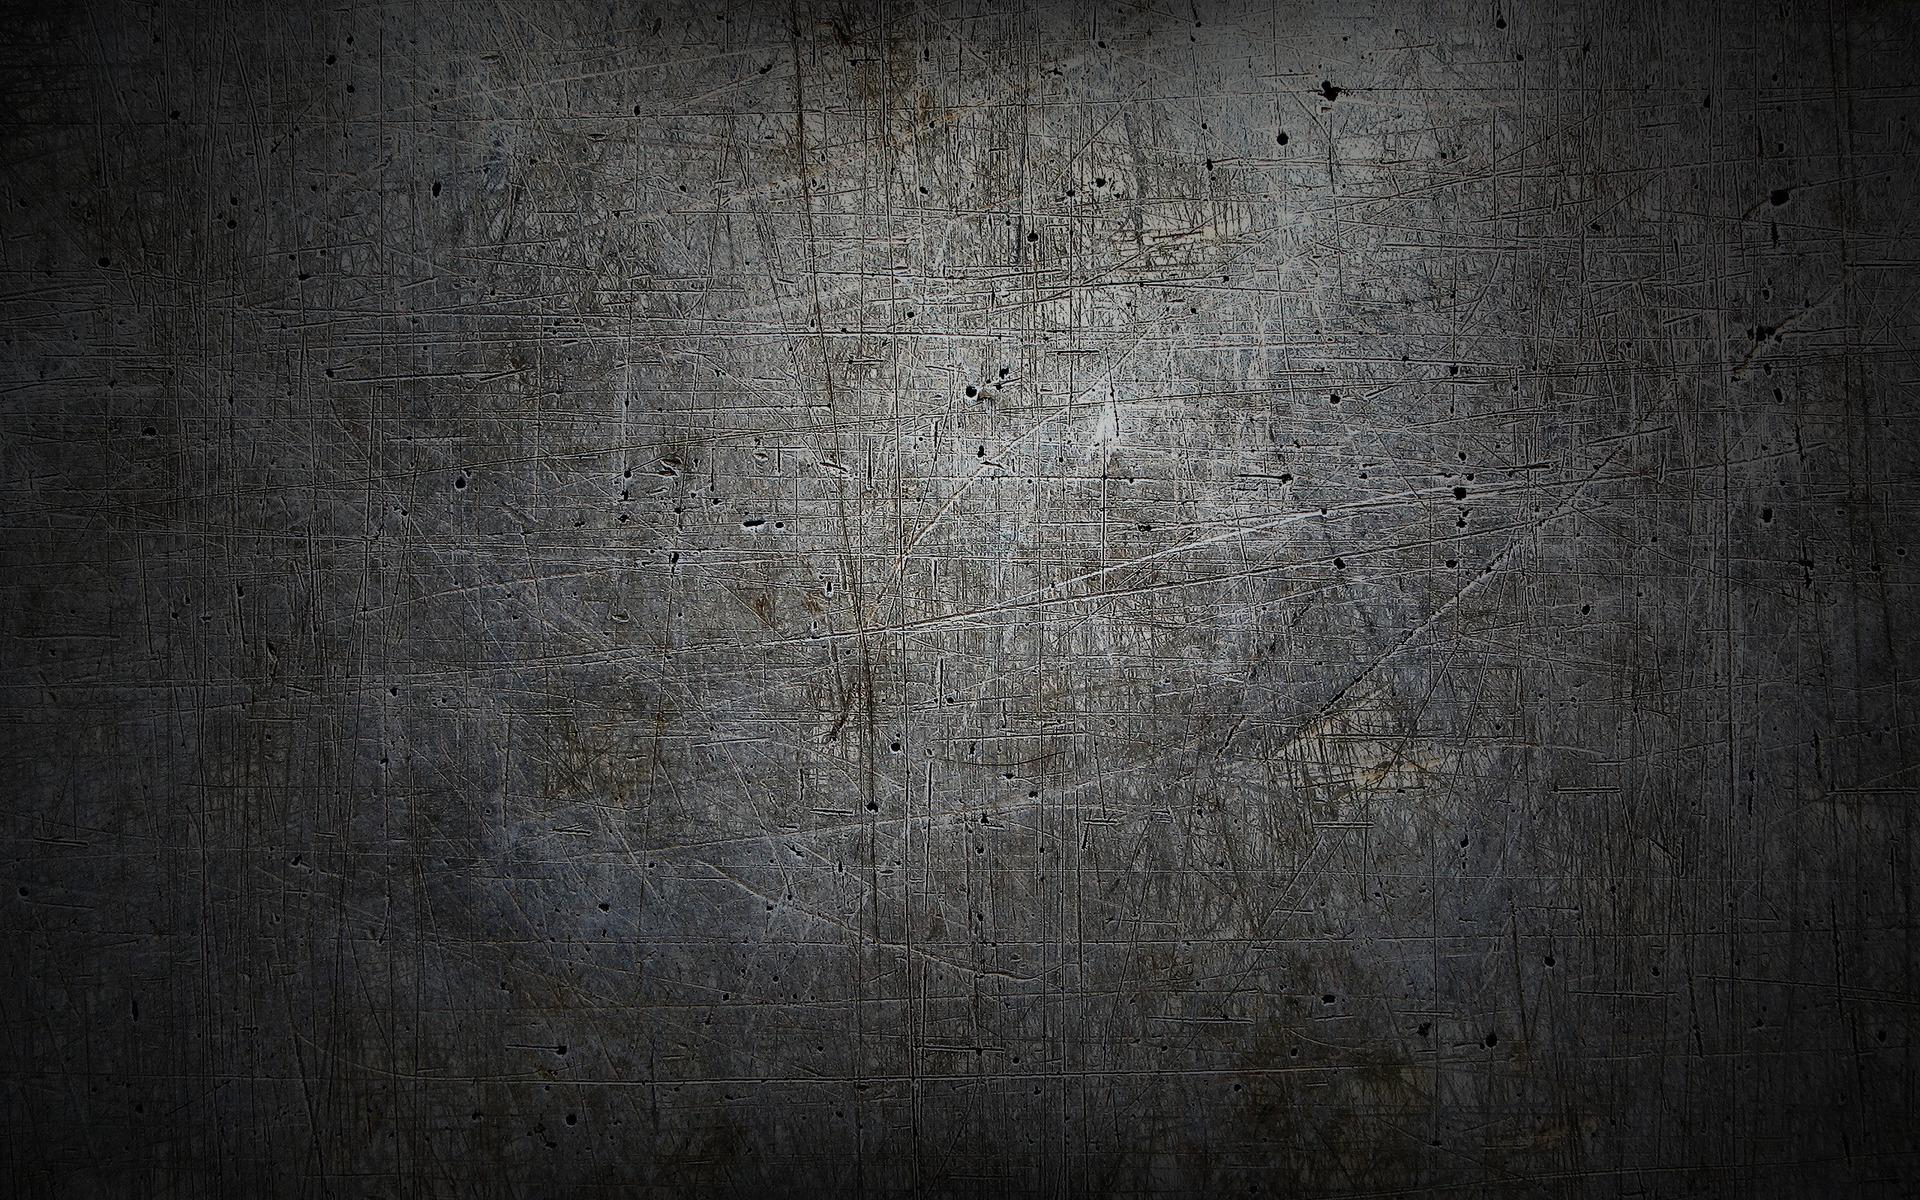 Hd stone wallpaper wallpapersafari for Black wall wallpaper